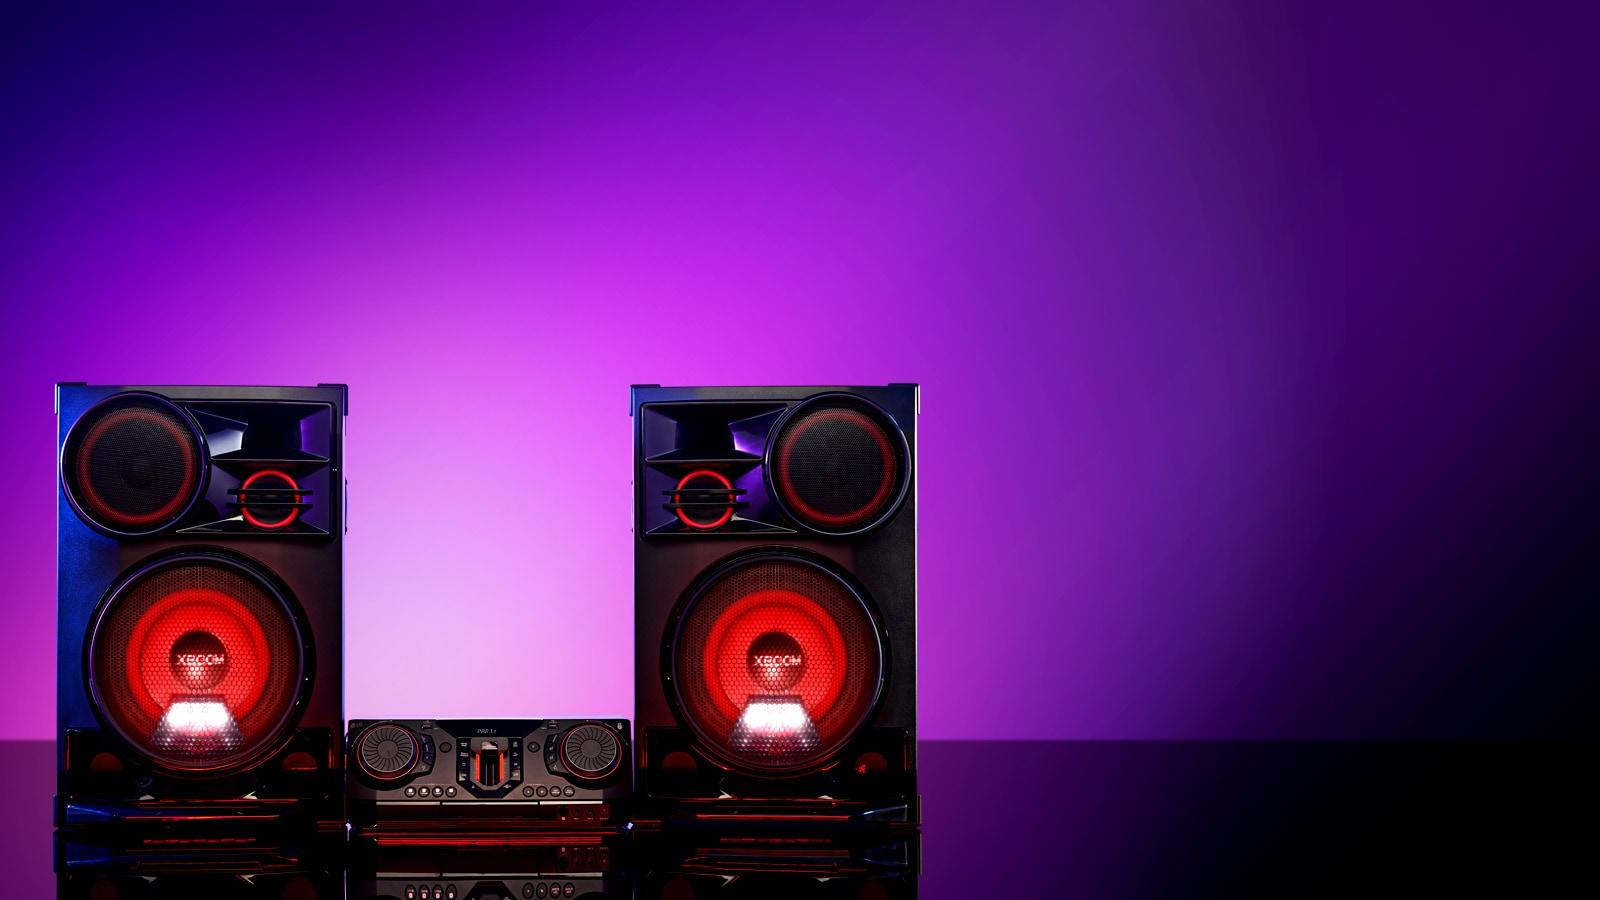 3500 Ватт звука